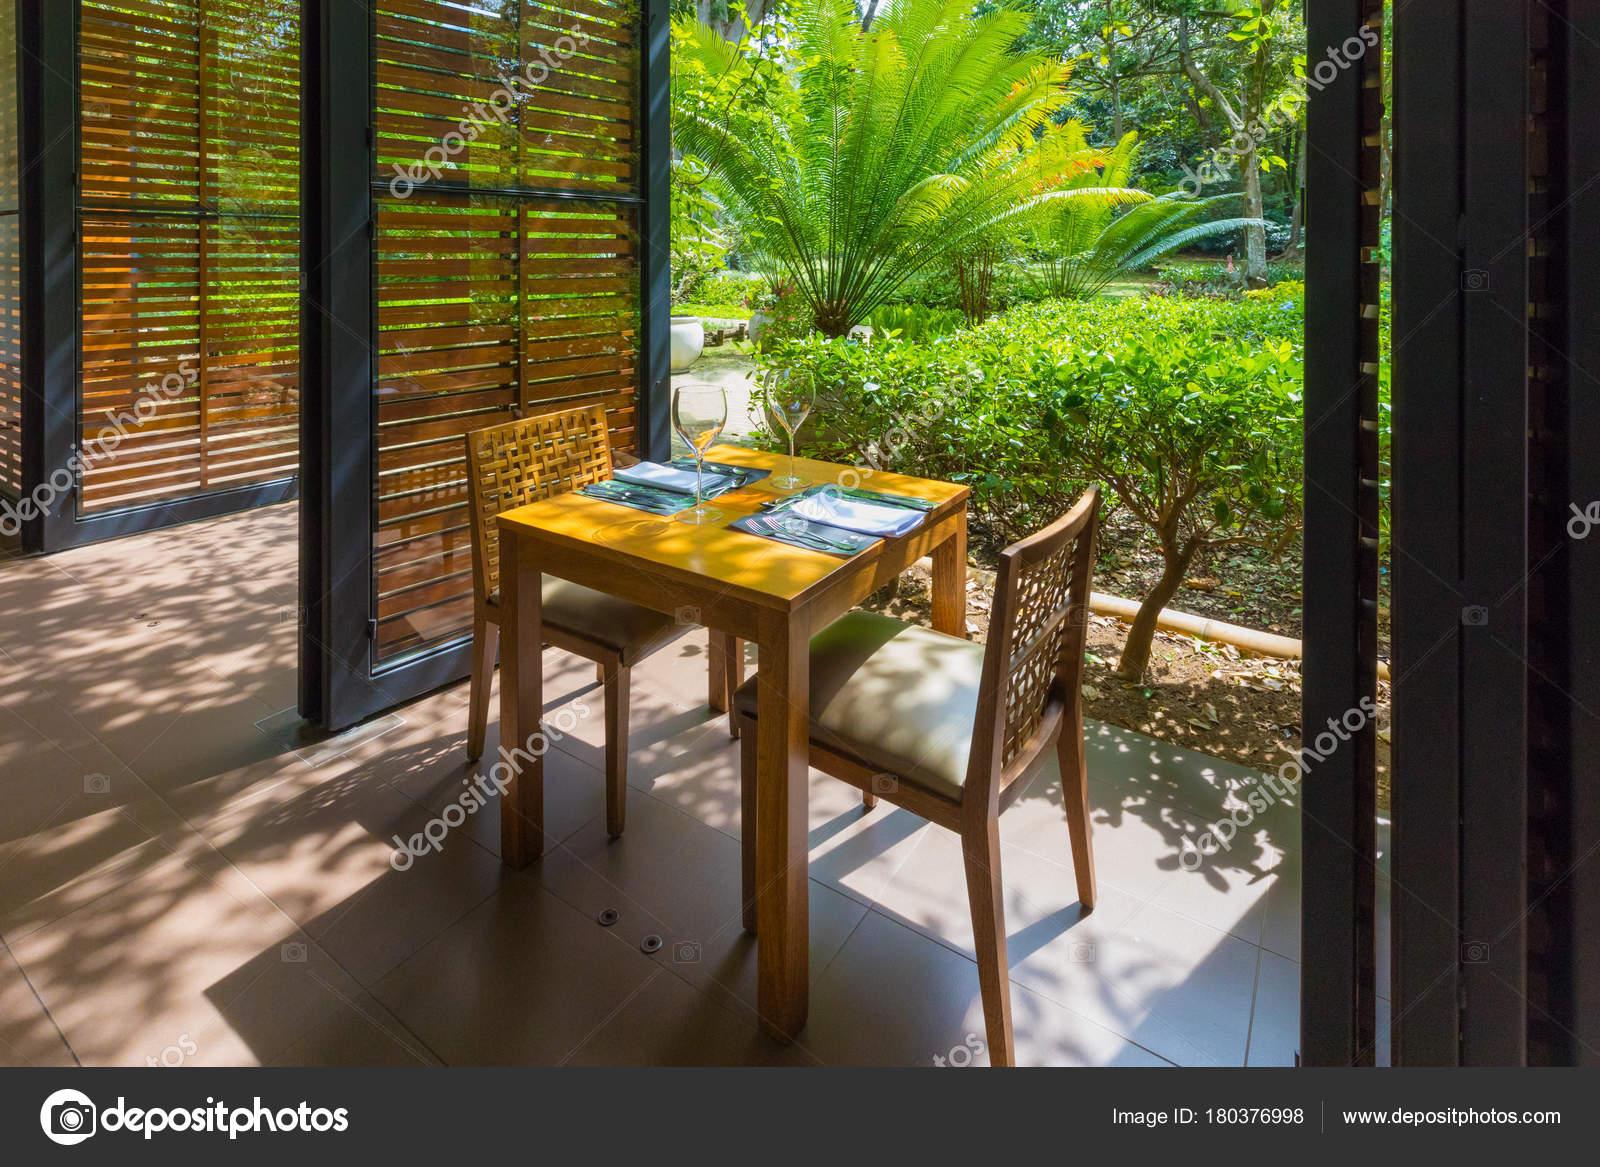 Restaurant Table Set Overlooking Tropical Garden Stock Photo C Markpittimages Gmail Com 180376998